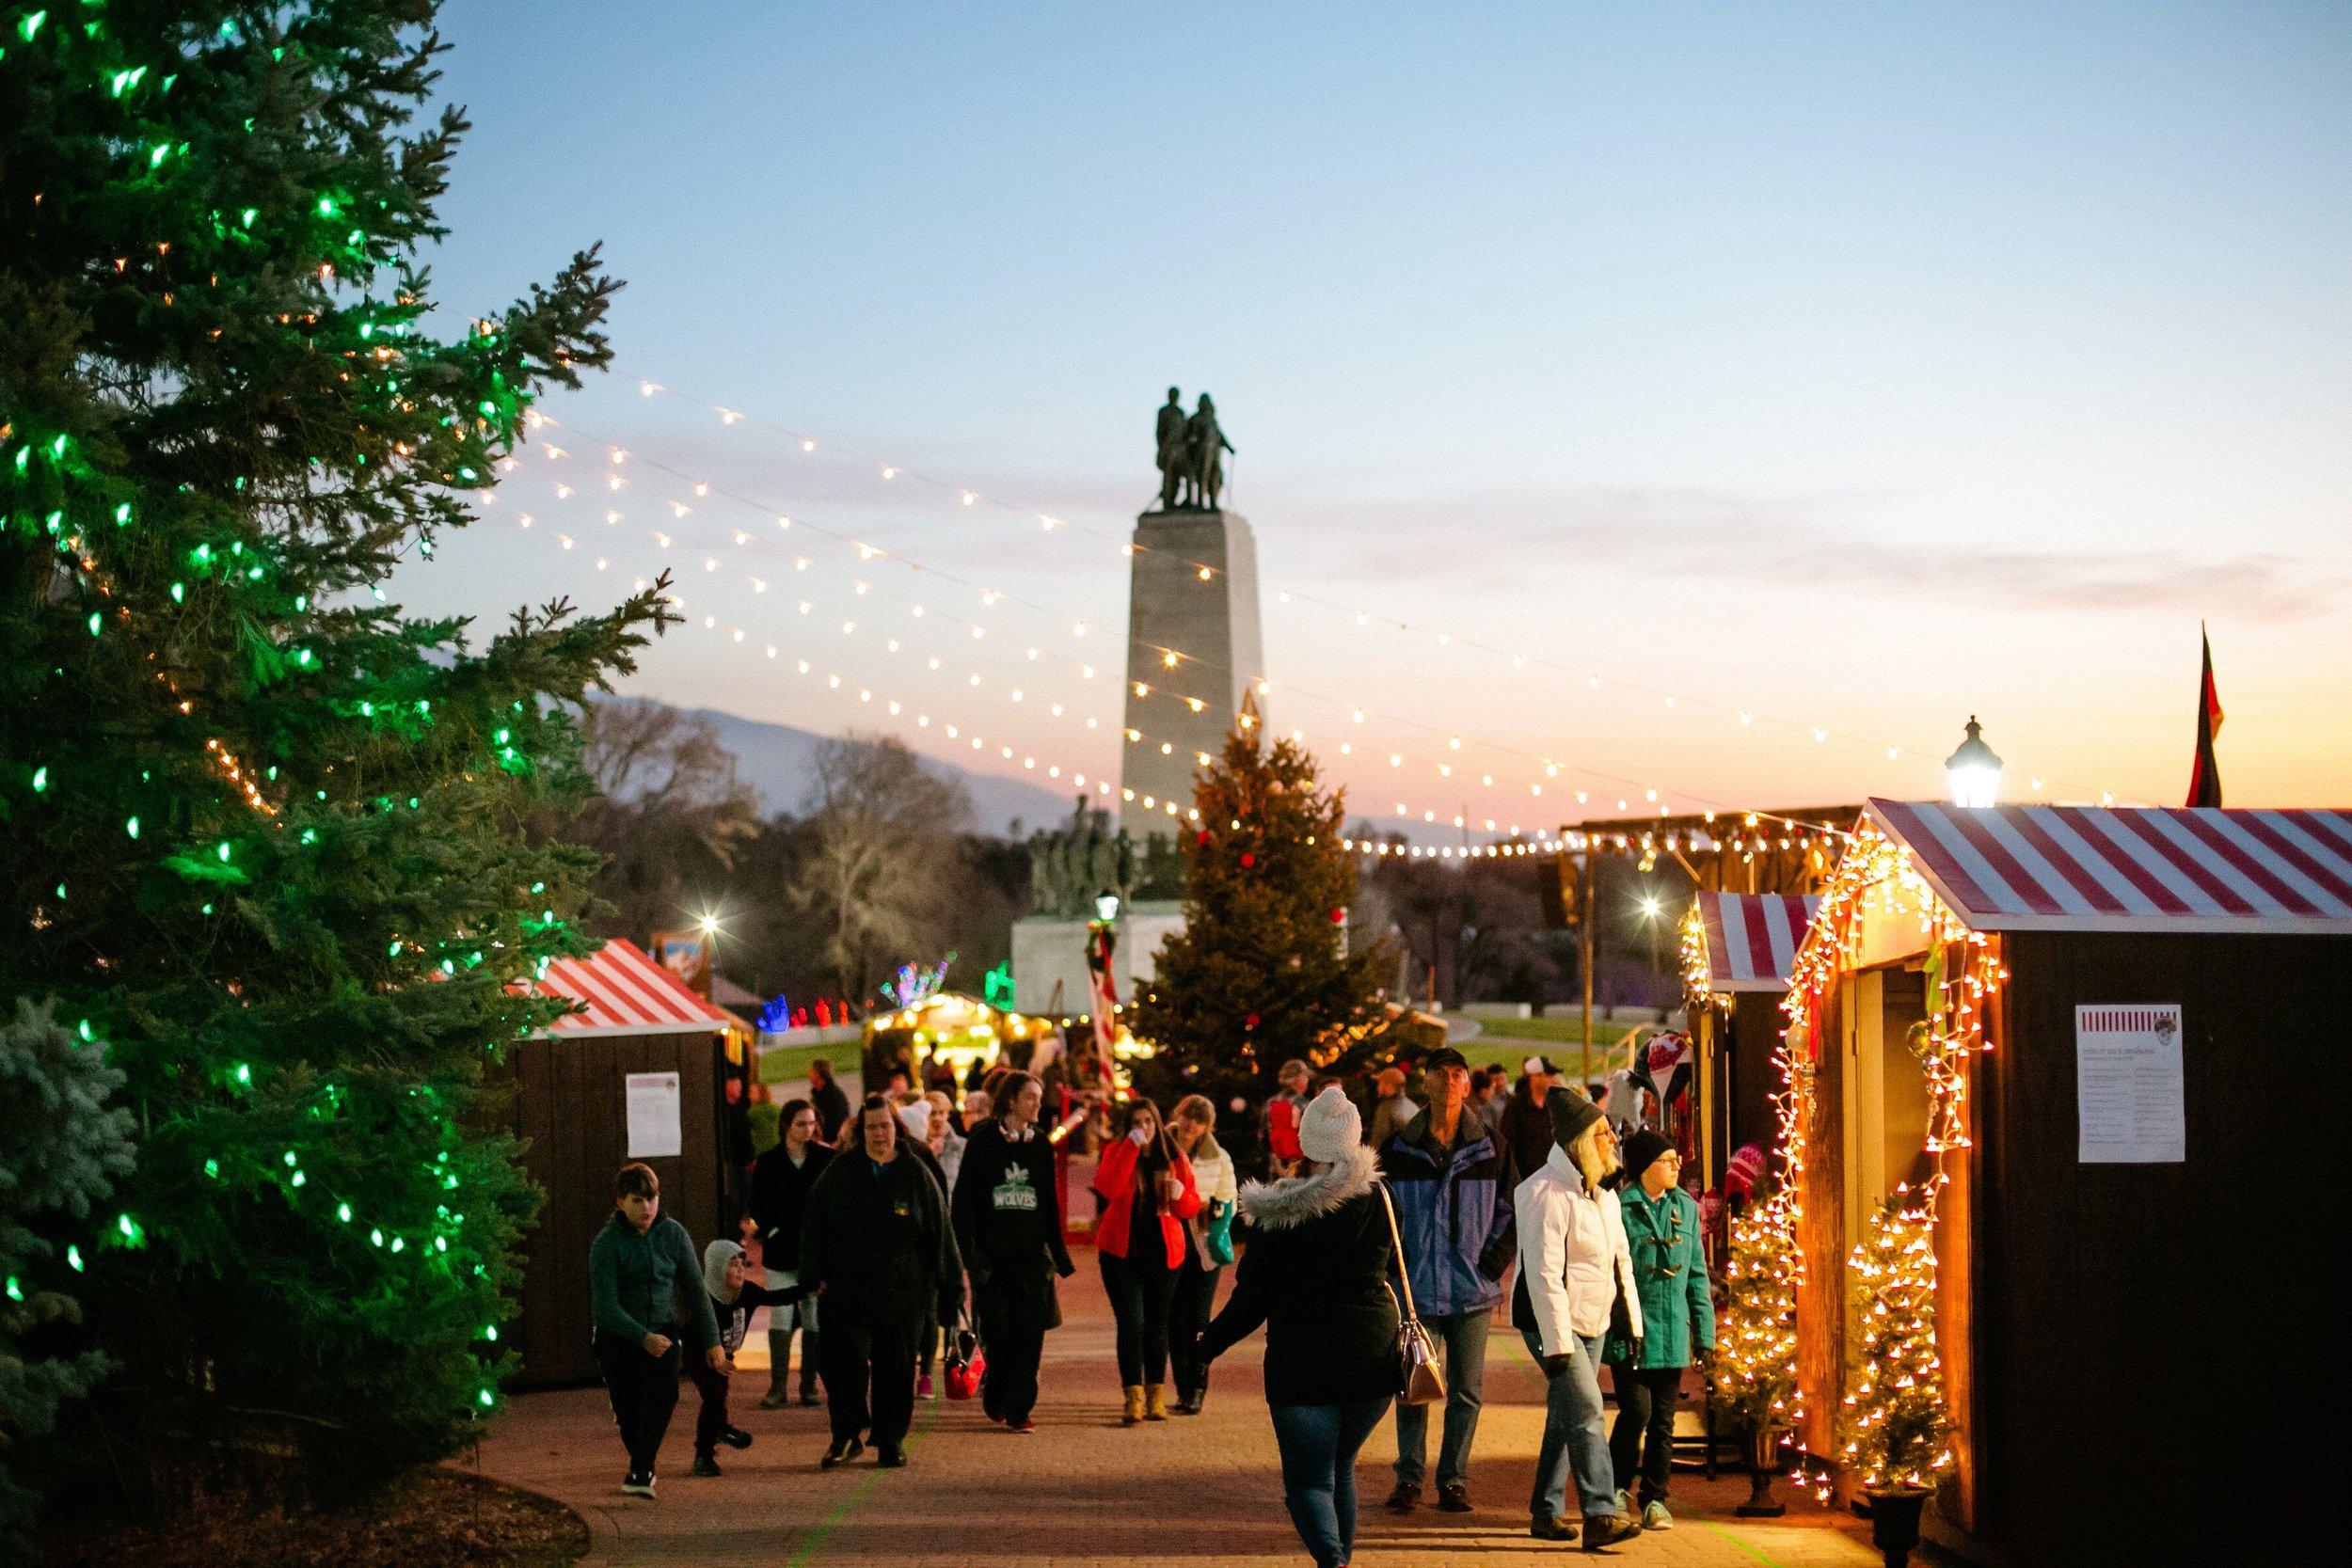 Christmas Activities In Slc 2021 Christkindlmarkt Slc